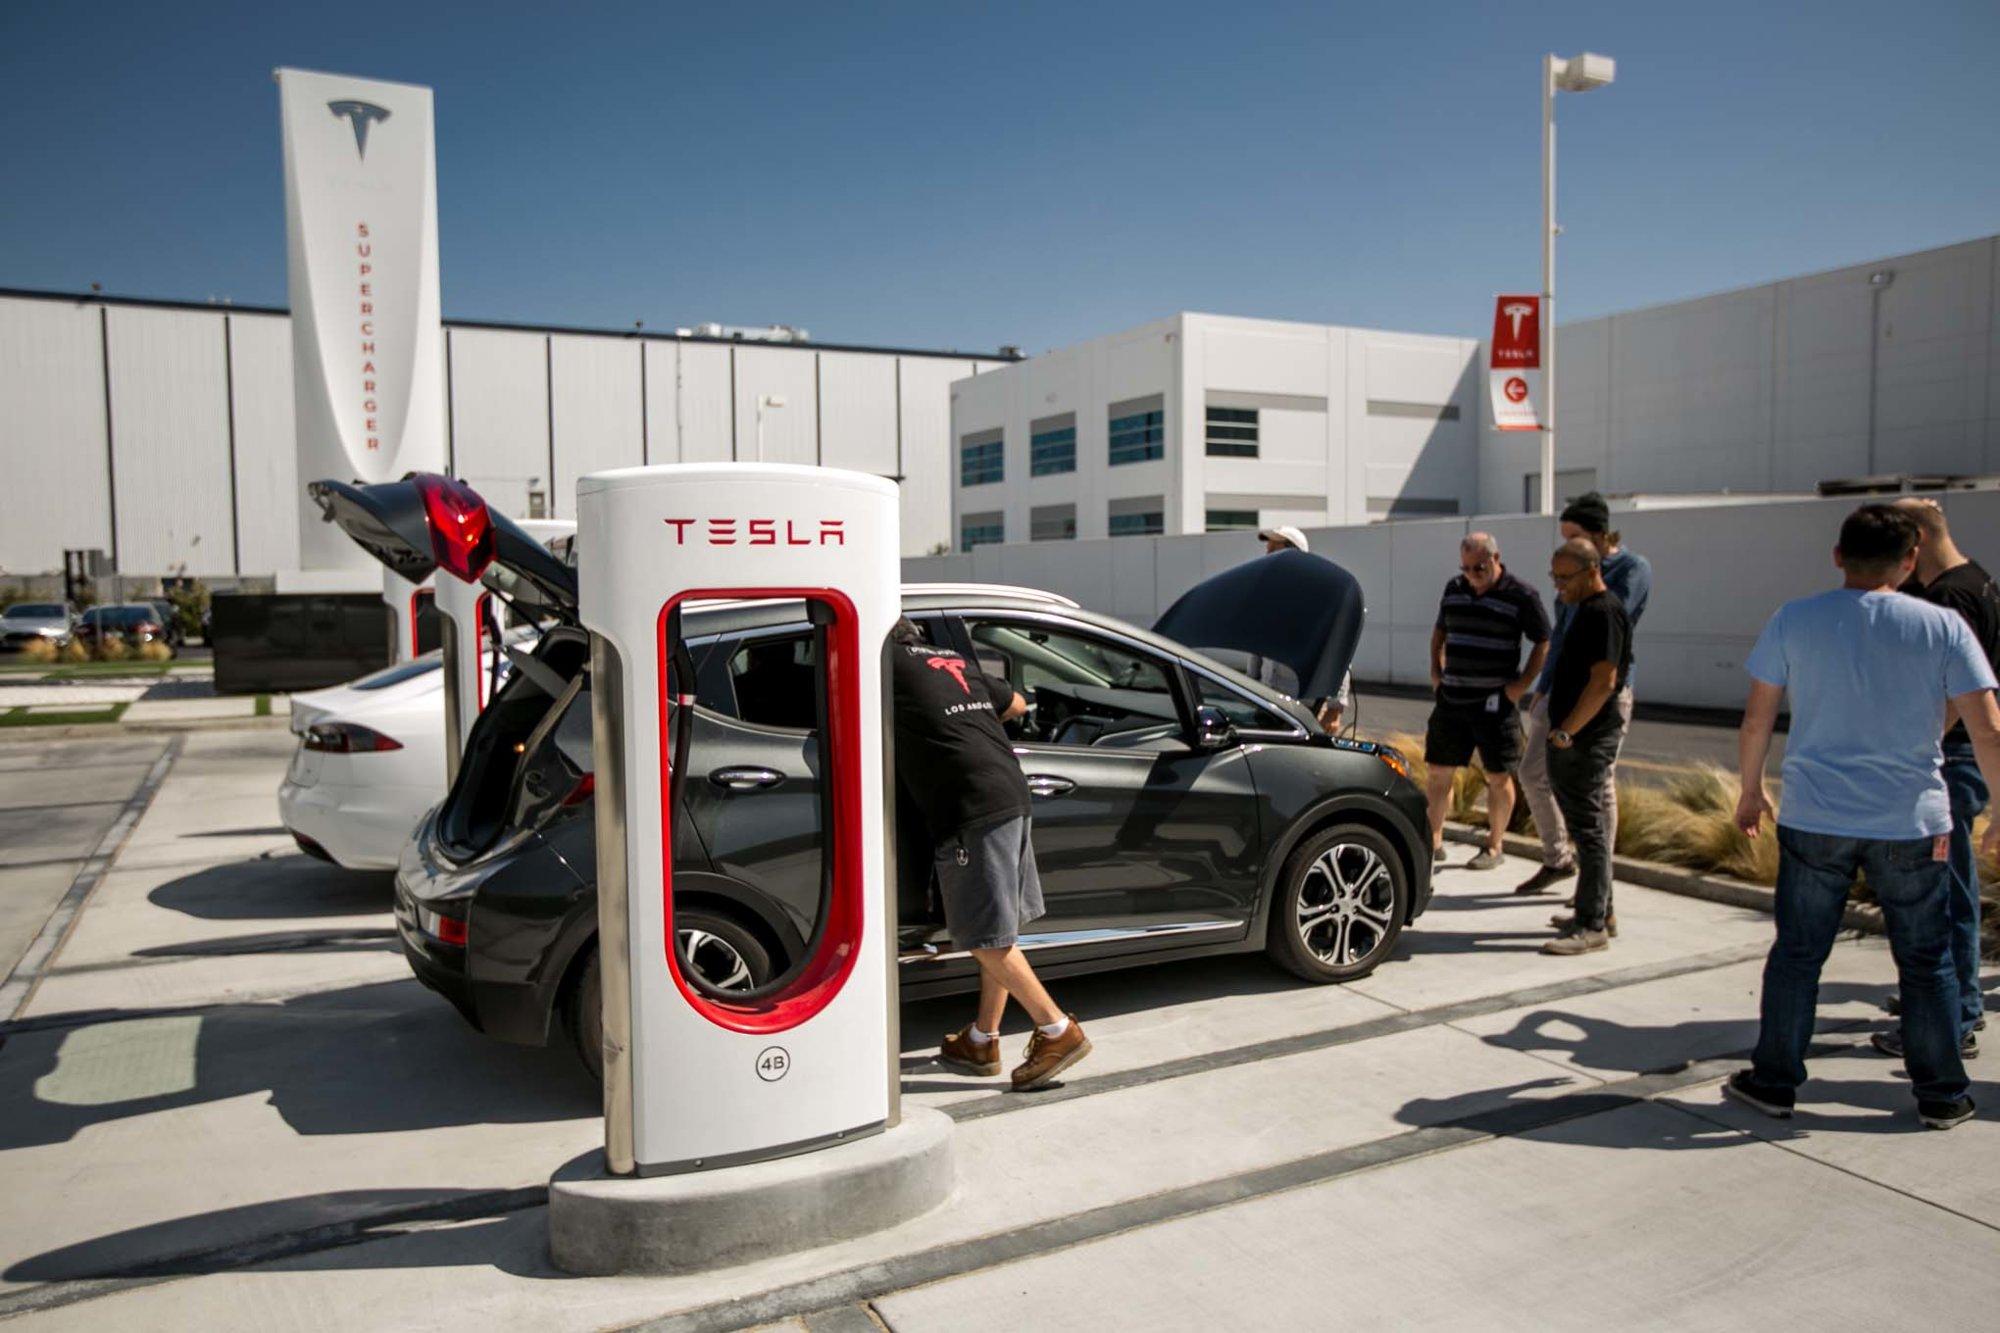 Chevrolet-Bolt-at-Space-X-Tesla-Design-Studio-09.jpg